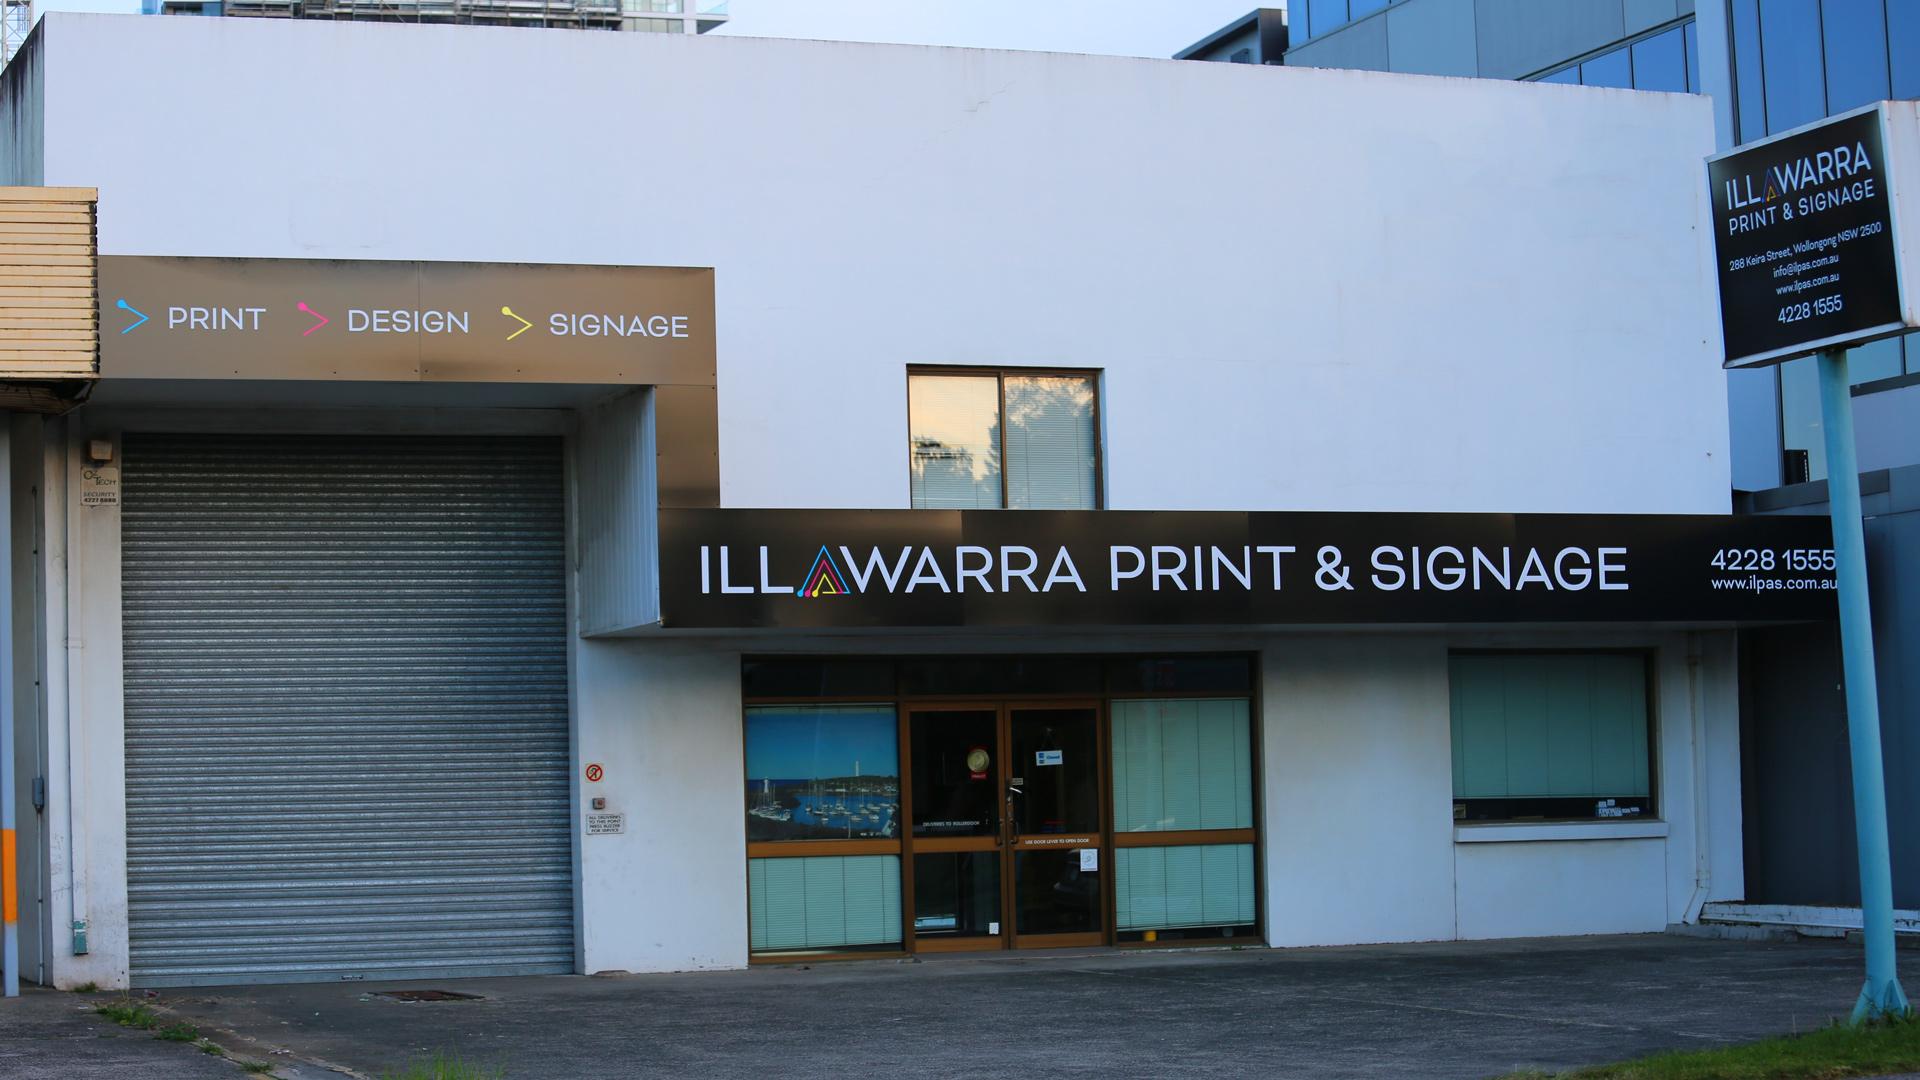 Illawarra Print and Signage Shopfront